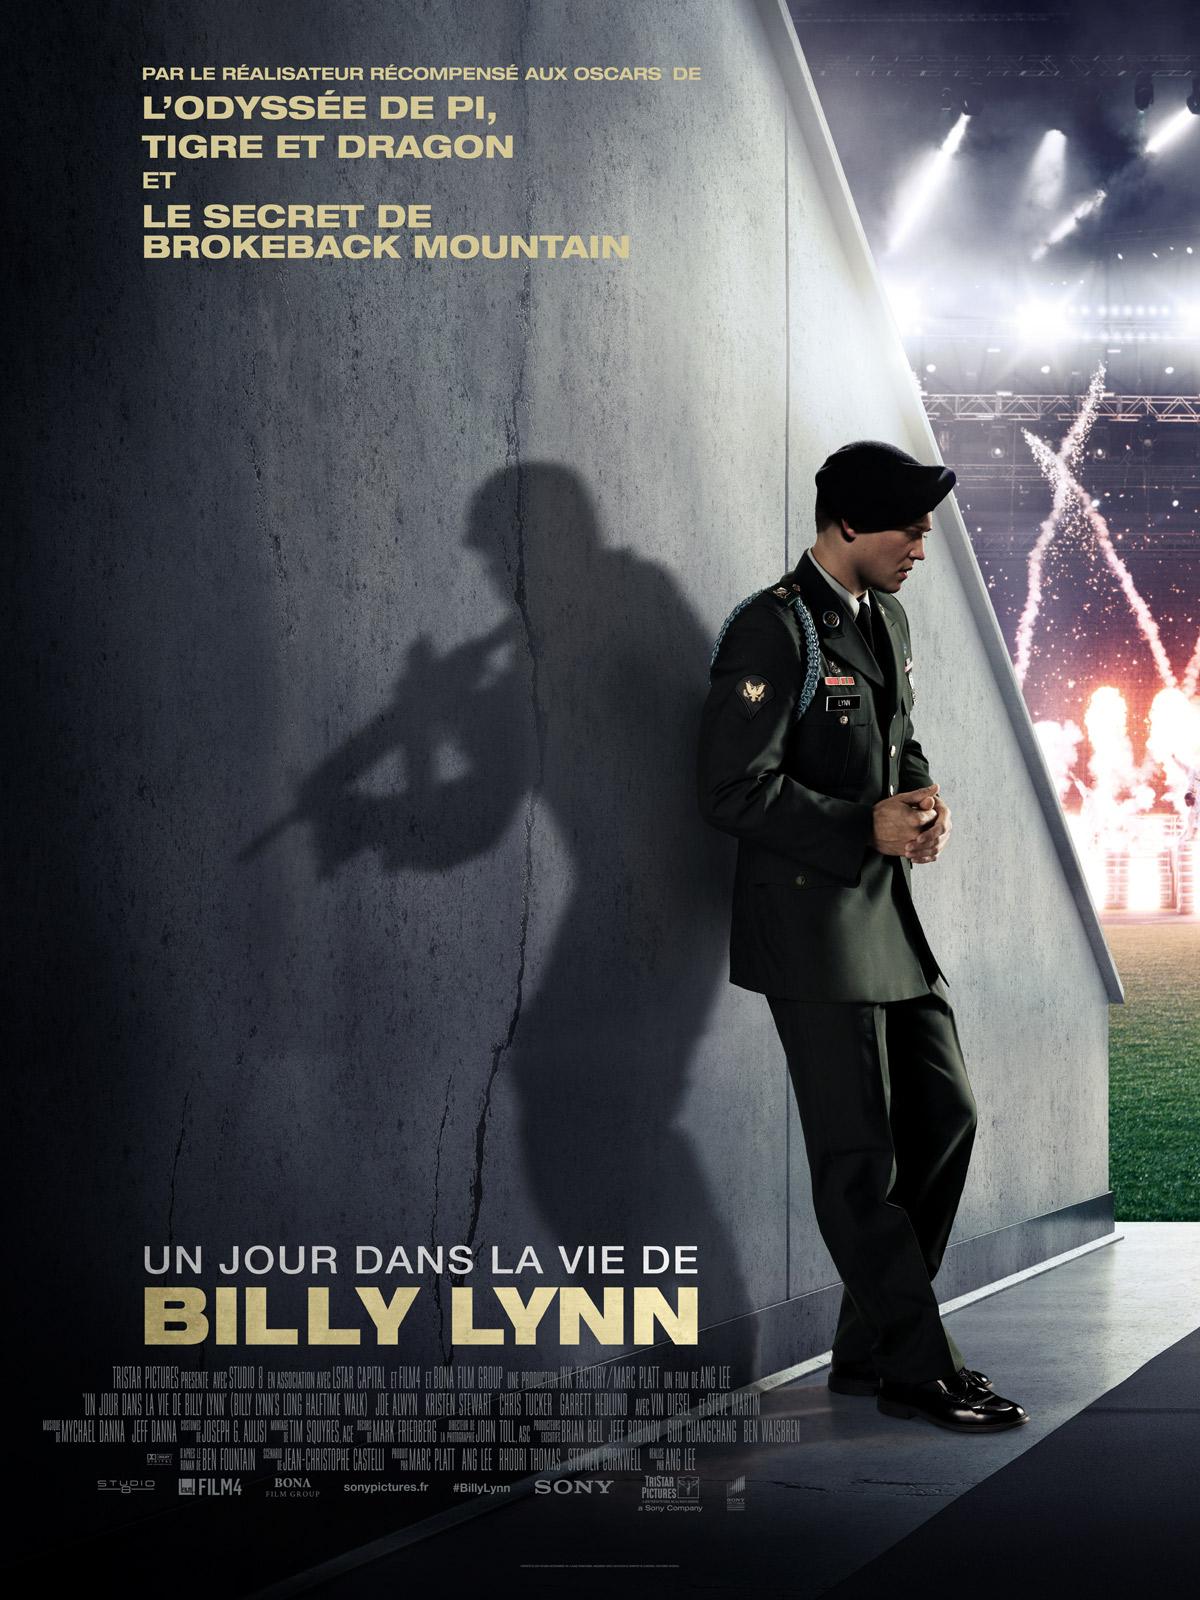 Un jour dans la vie de Billy Lynn Truefrench BRRiP